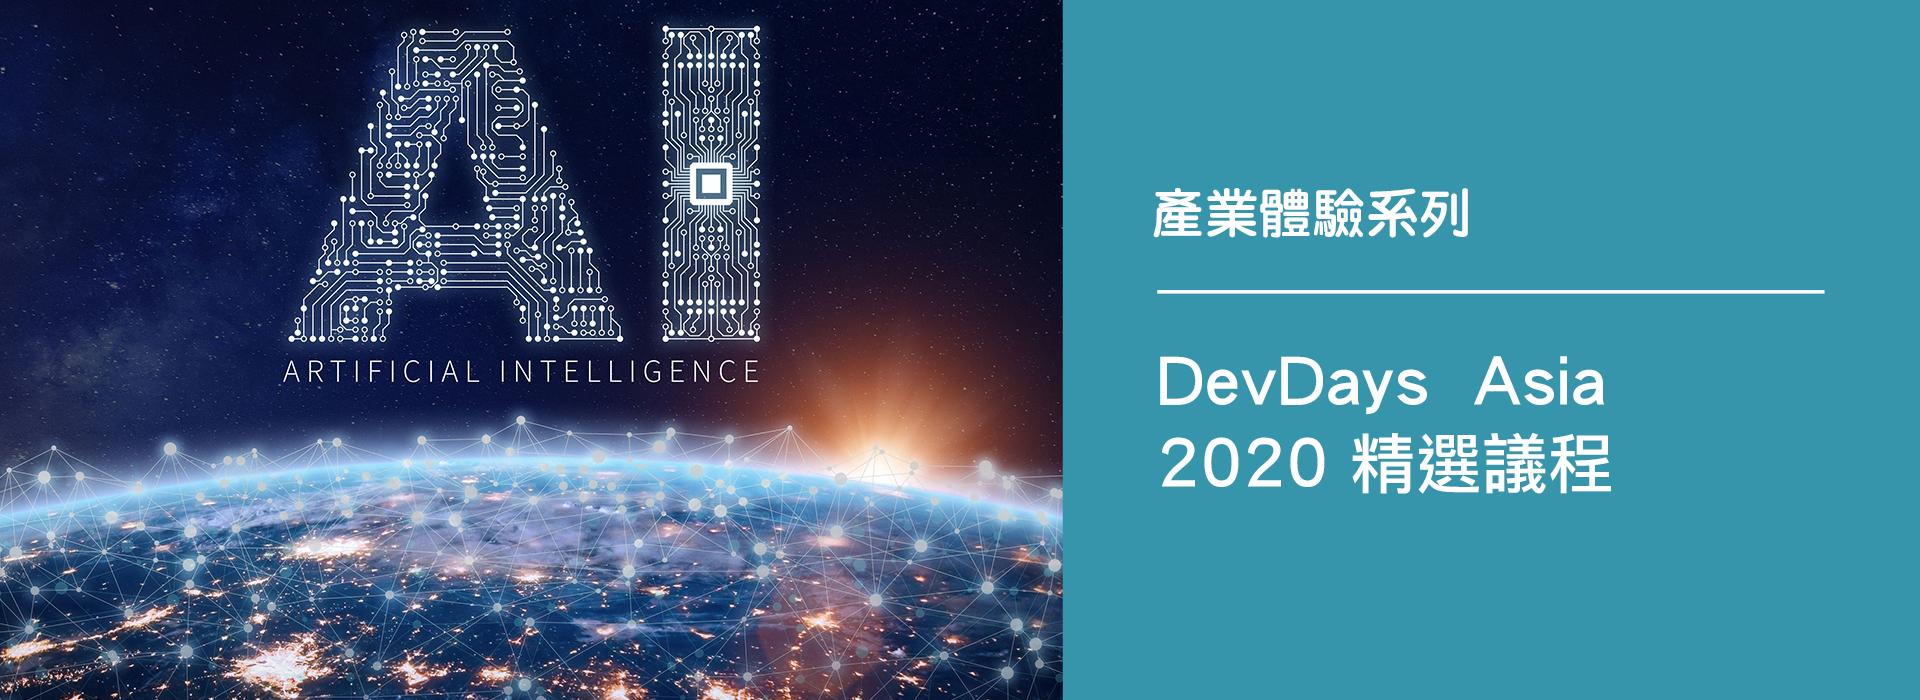 DevDays Asia 2020 精選議程